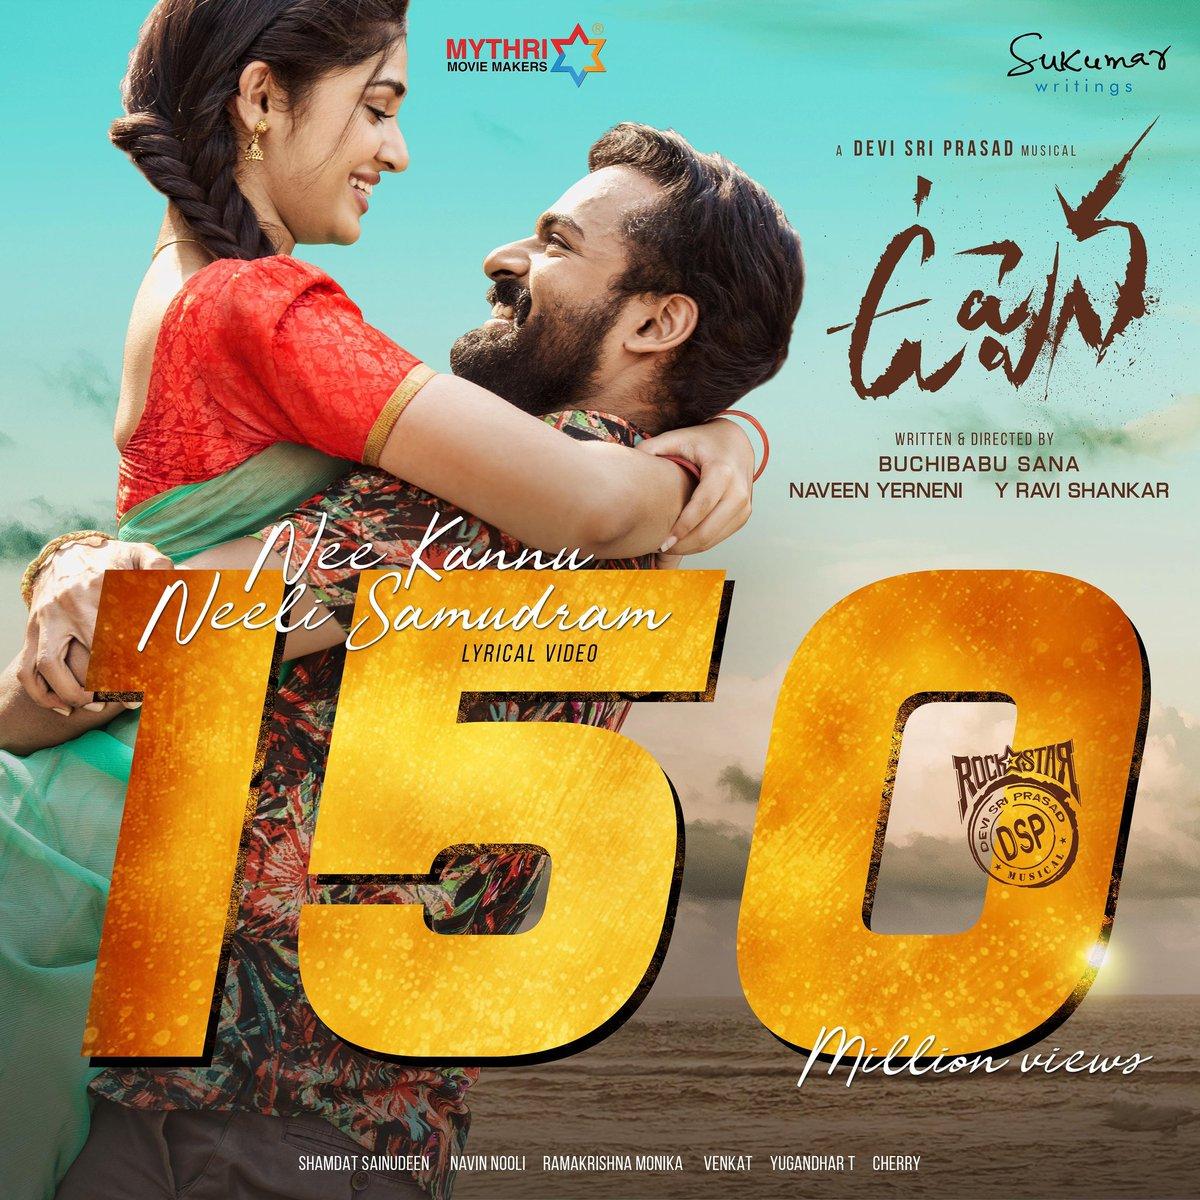 *150 Million hearts for 'Nee Kannu Neeli Samudram'❤️.... Thankyou all for the tremendous response 🙏*